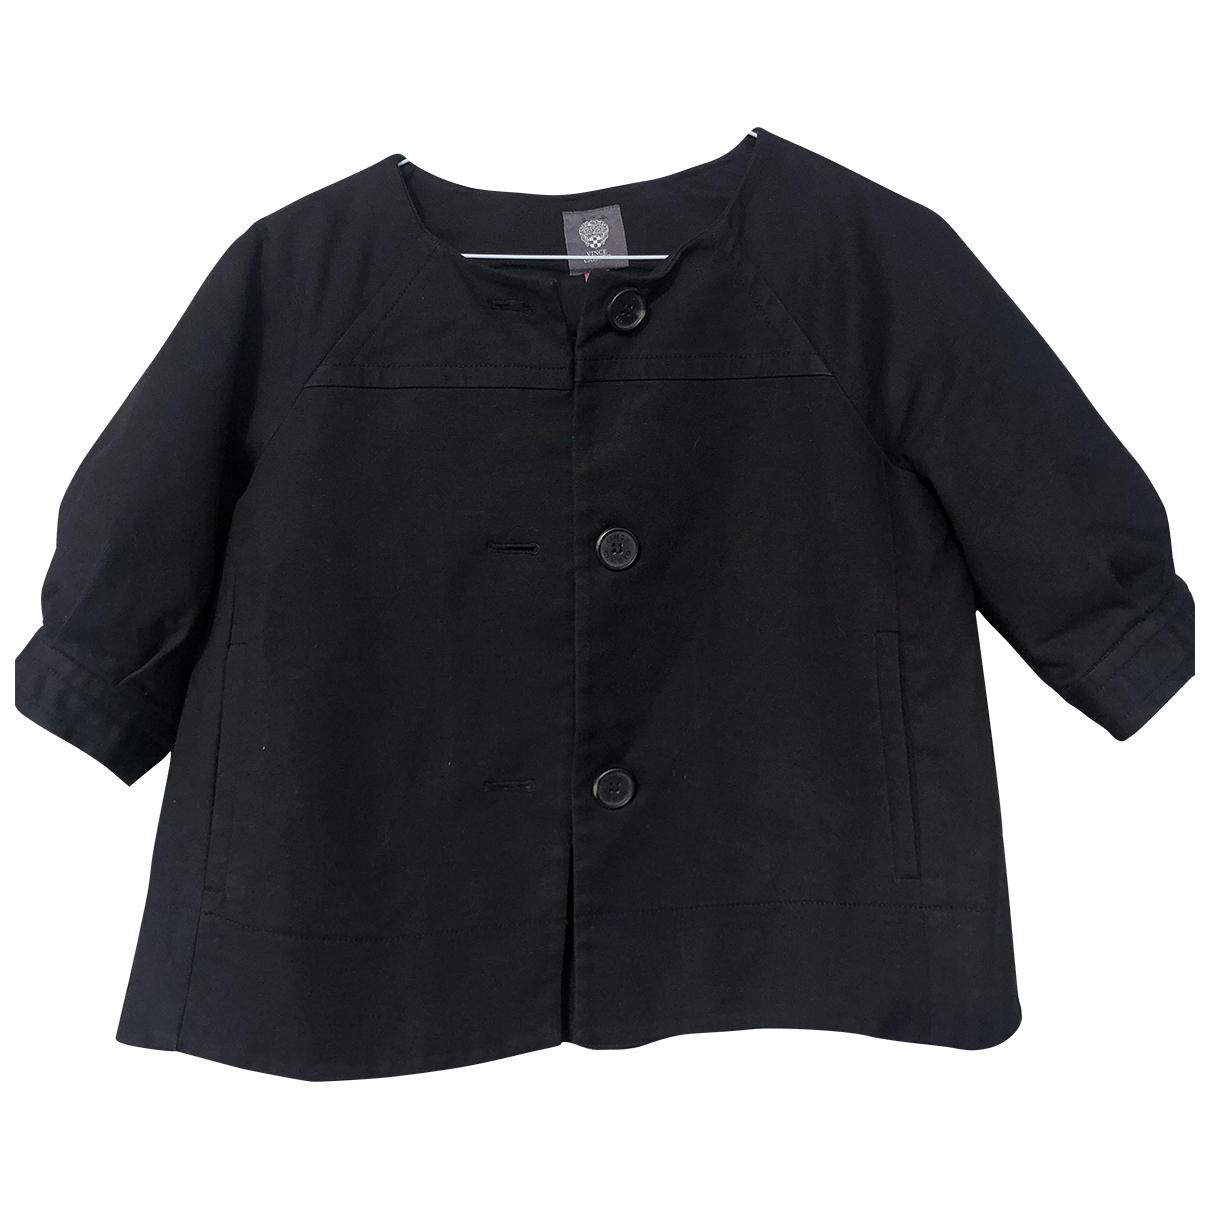 Vince Camuto \N Black Cotton jacket for Women S International